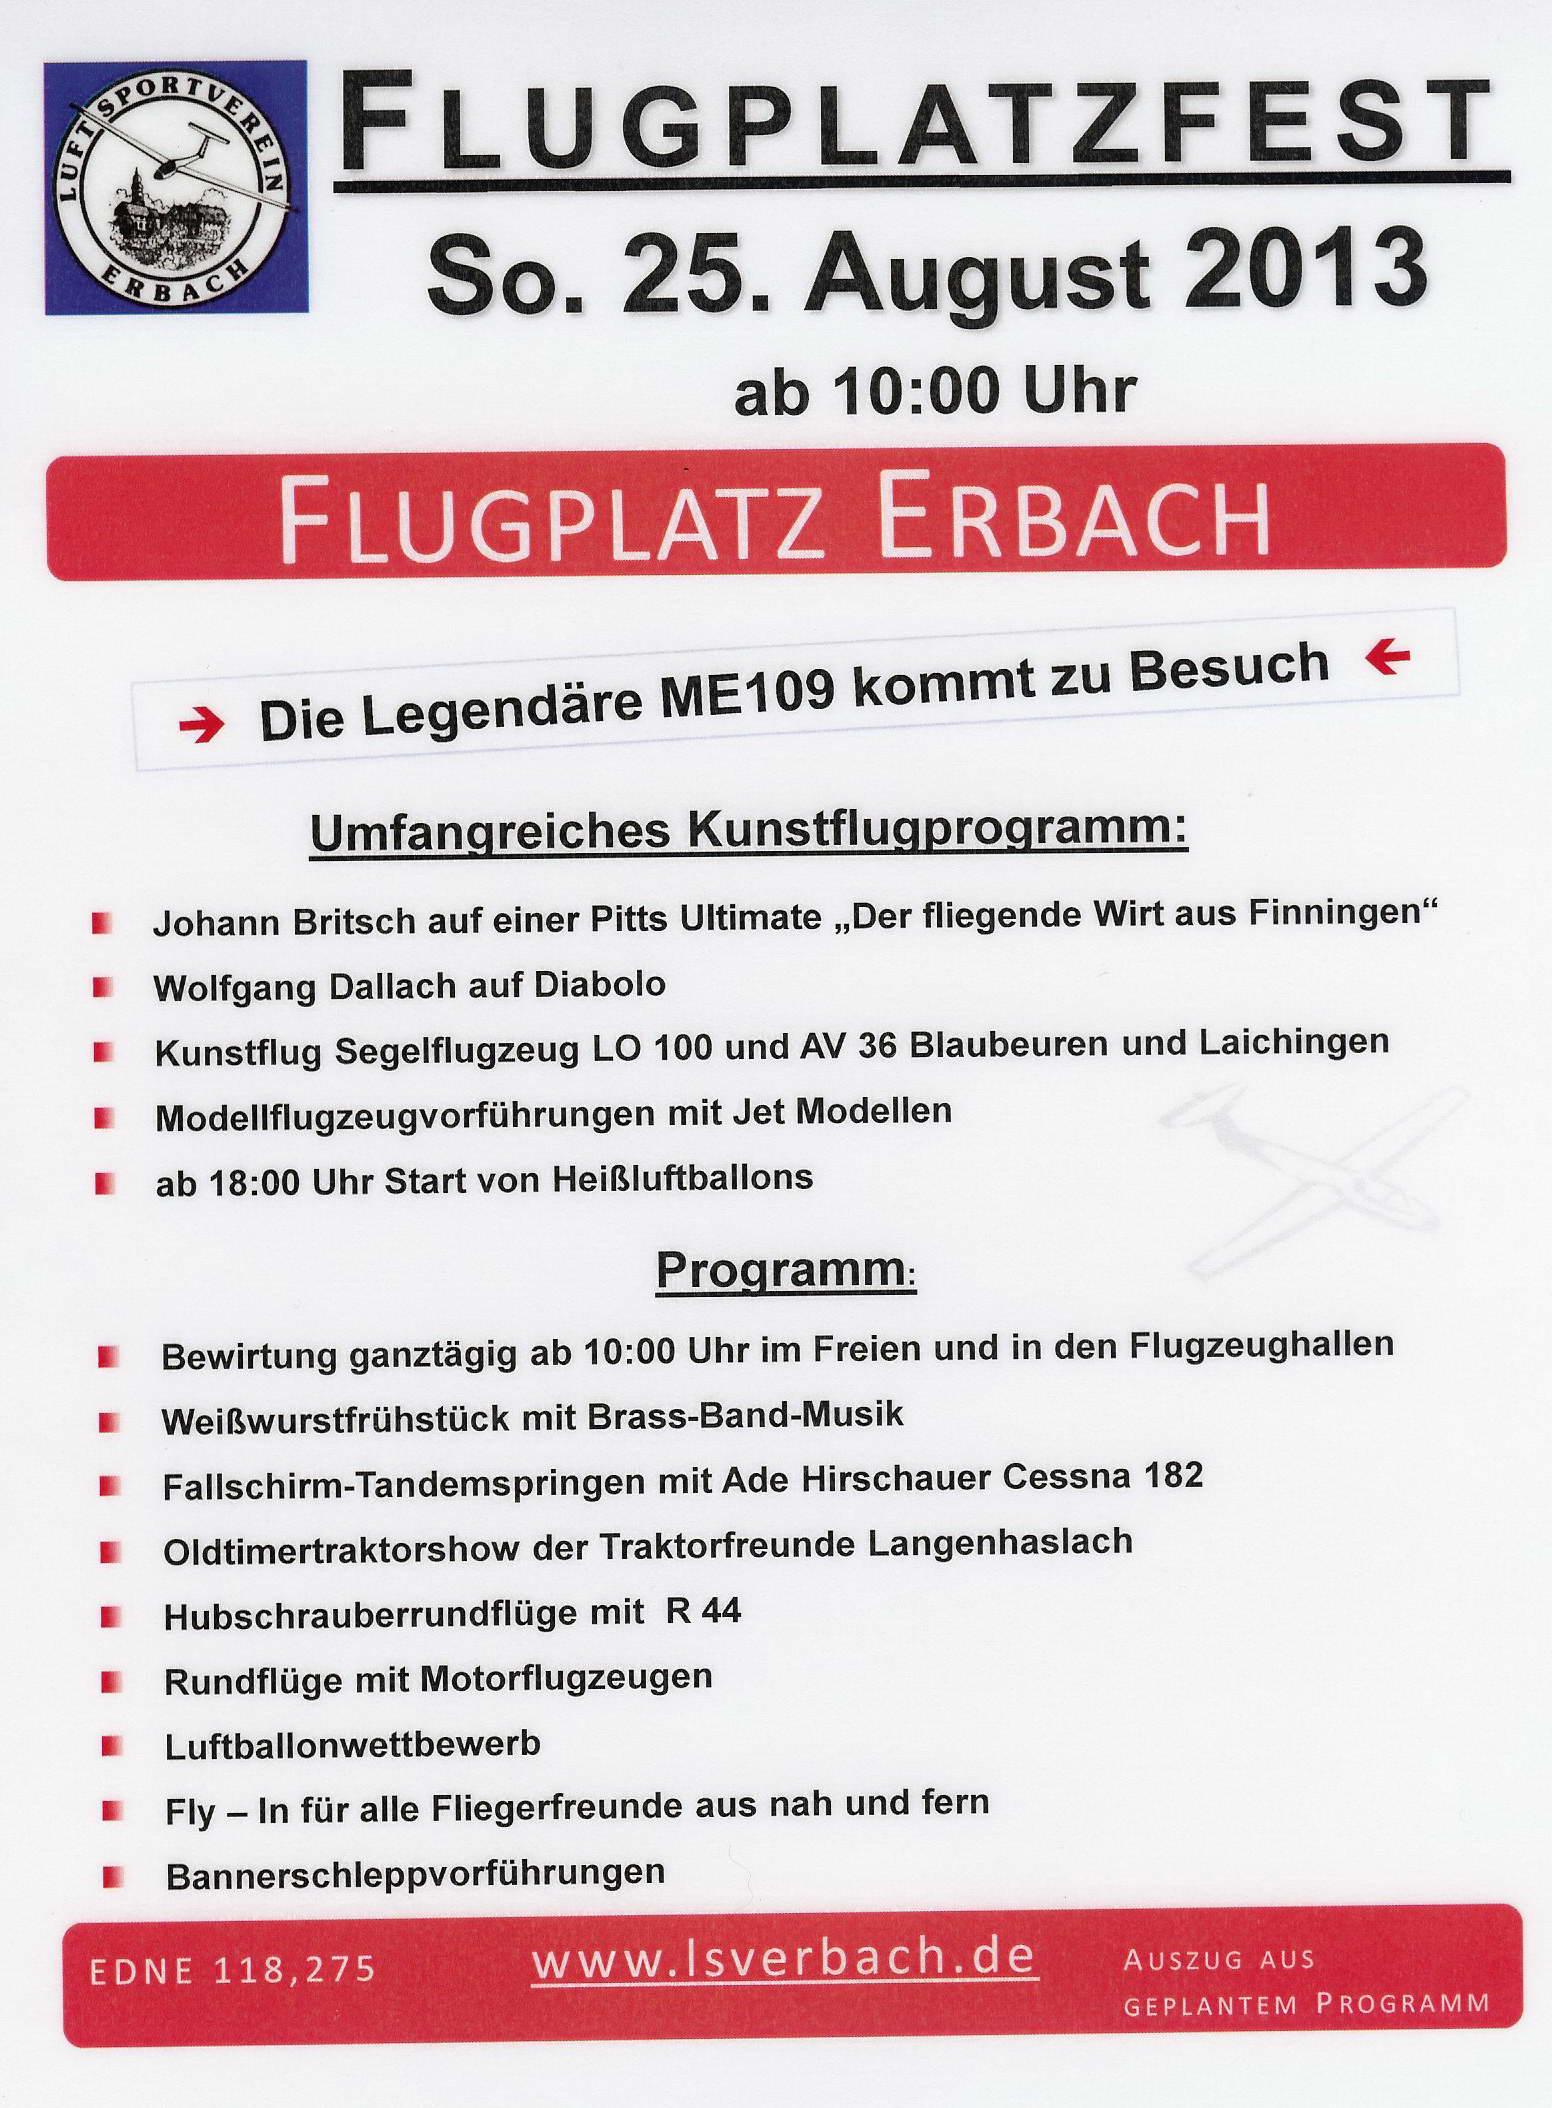 Flugplatzfest Luftsportverein Erbach e.V. 2013